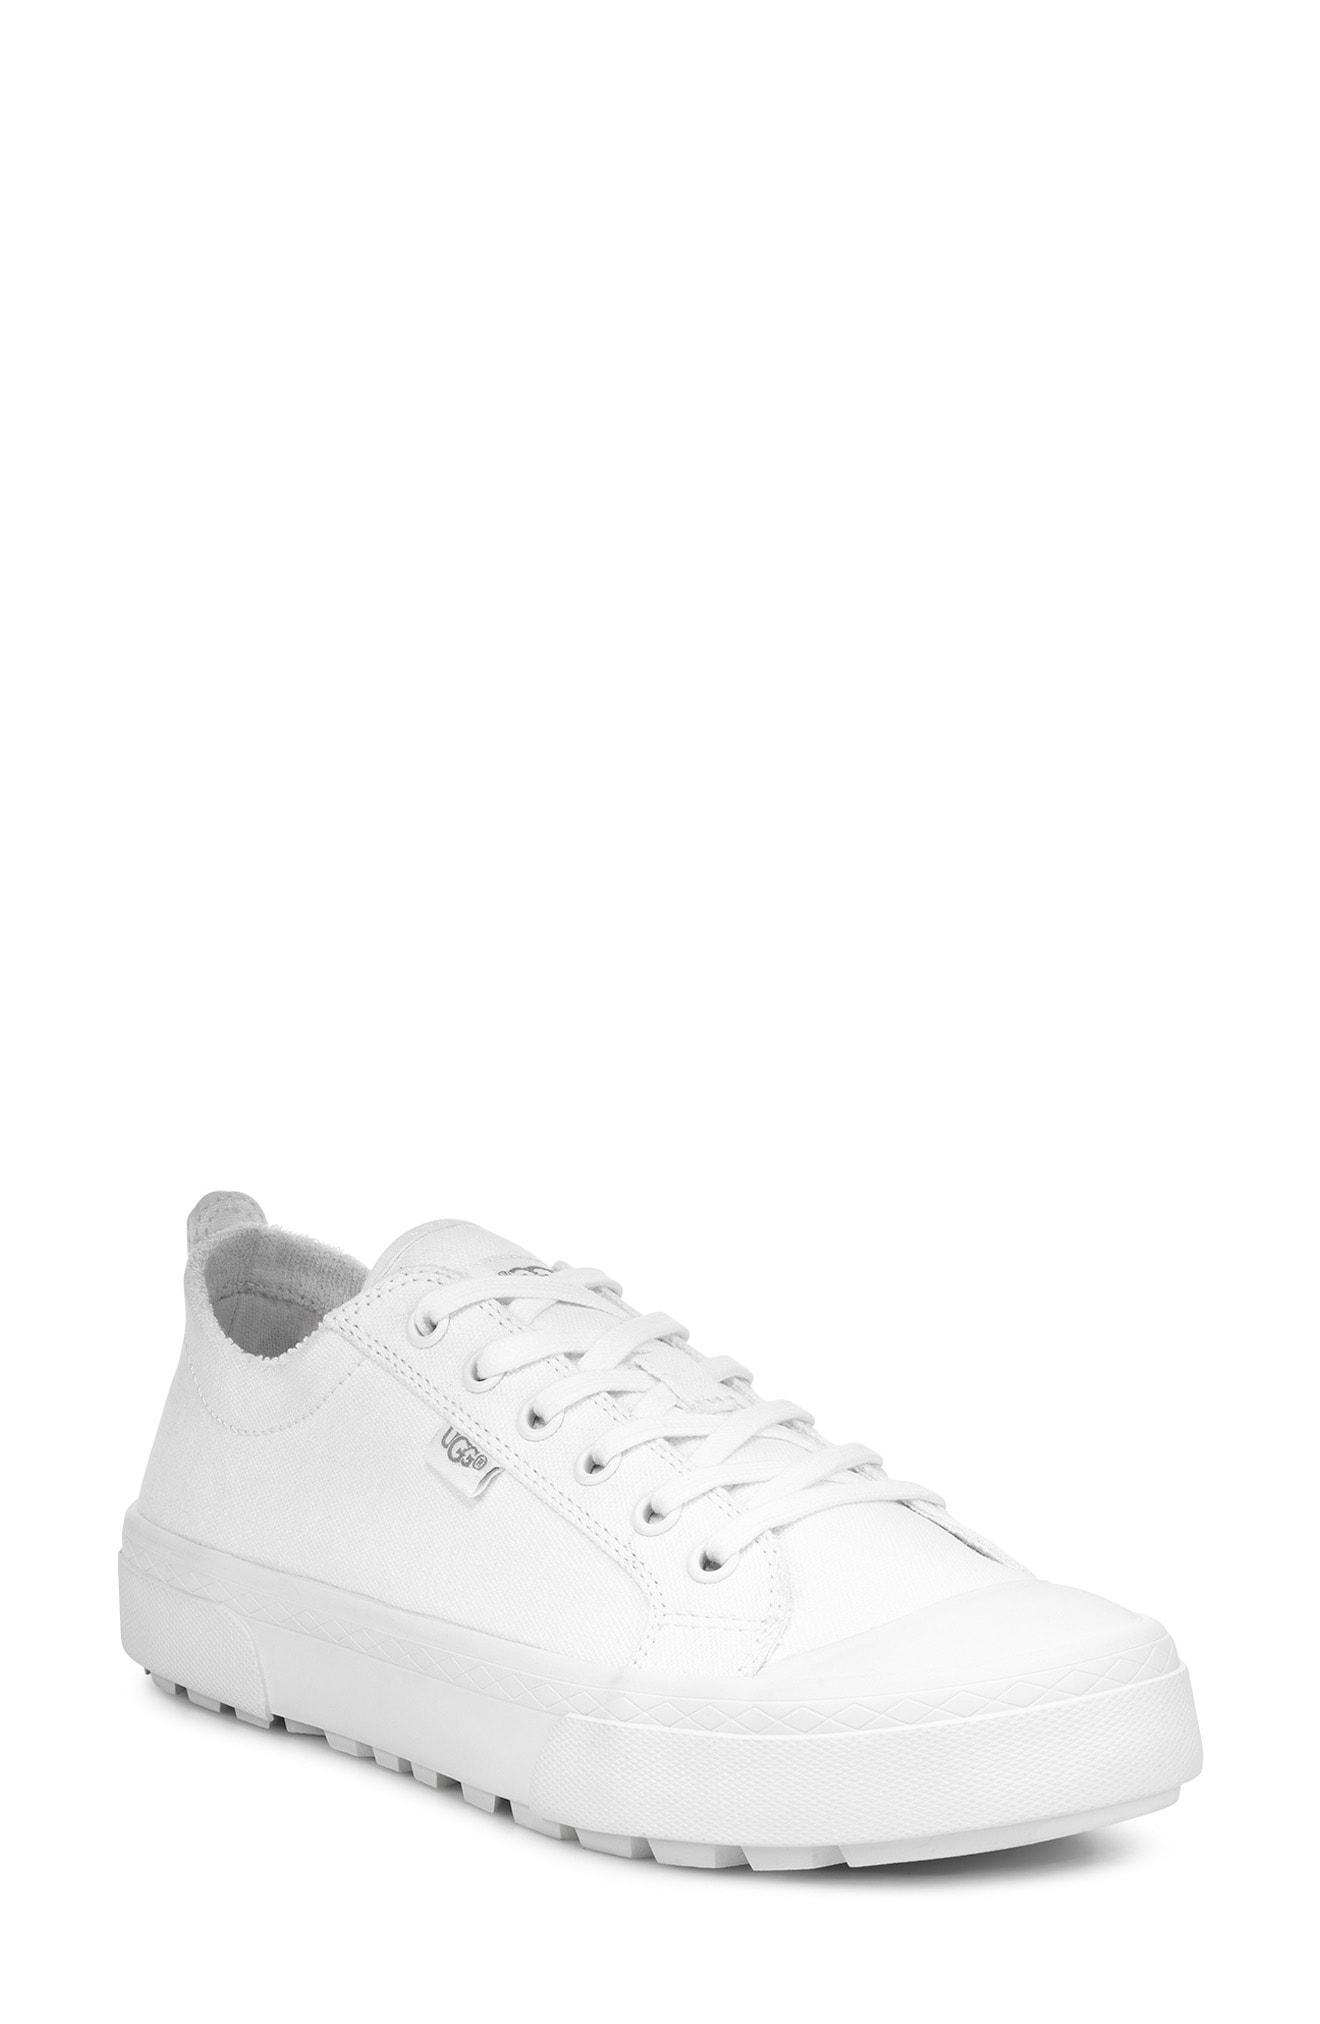 2edc3f31698 Lyst - UGG Ugg Aries Platform Sneaker in White